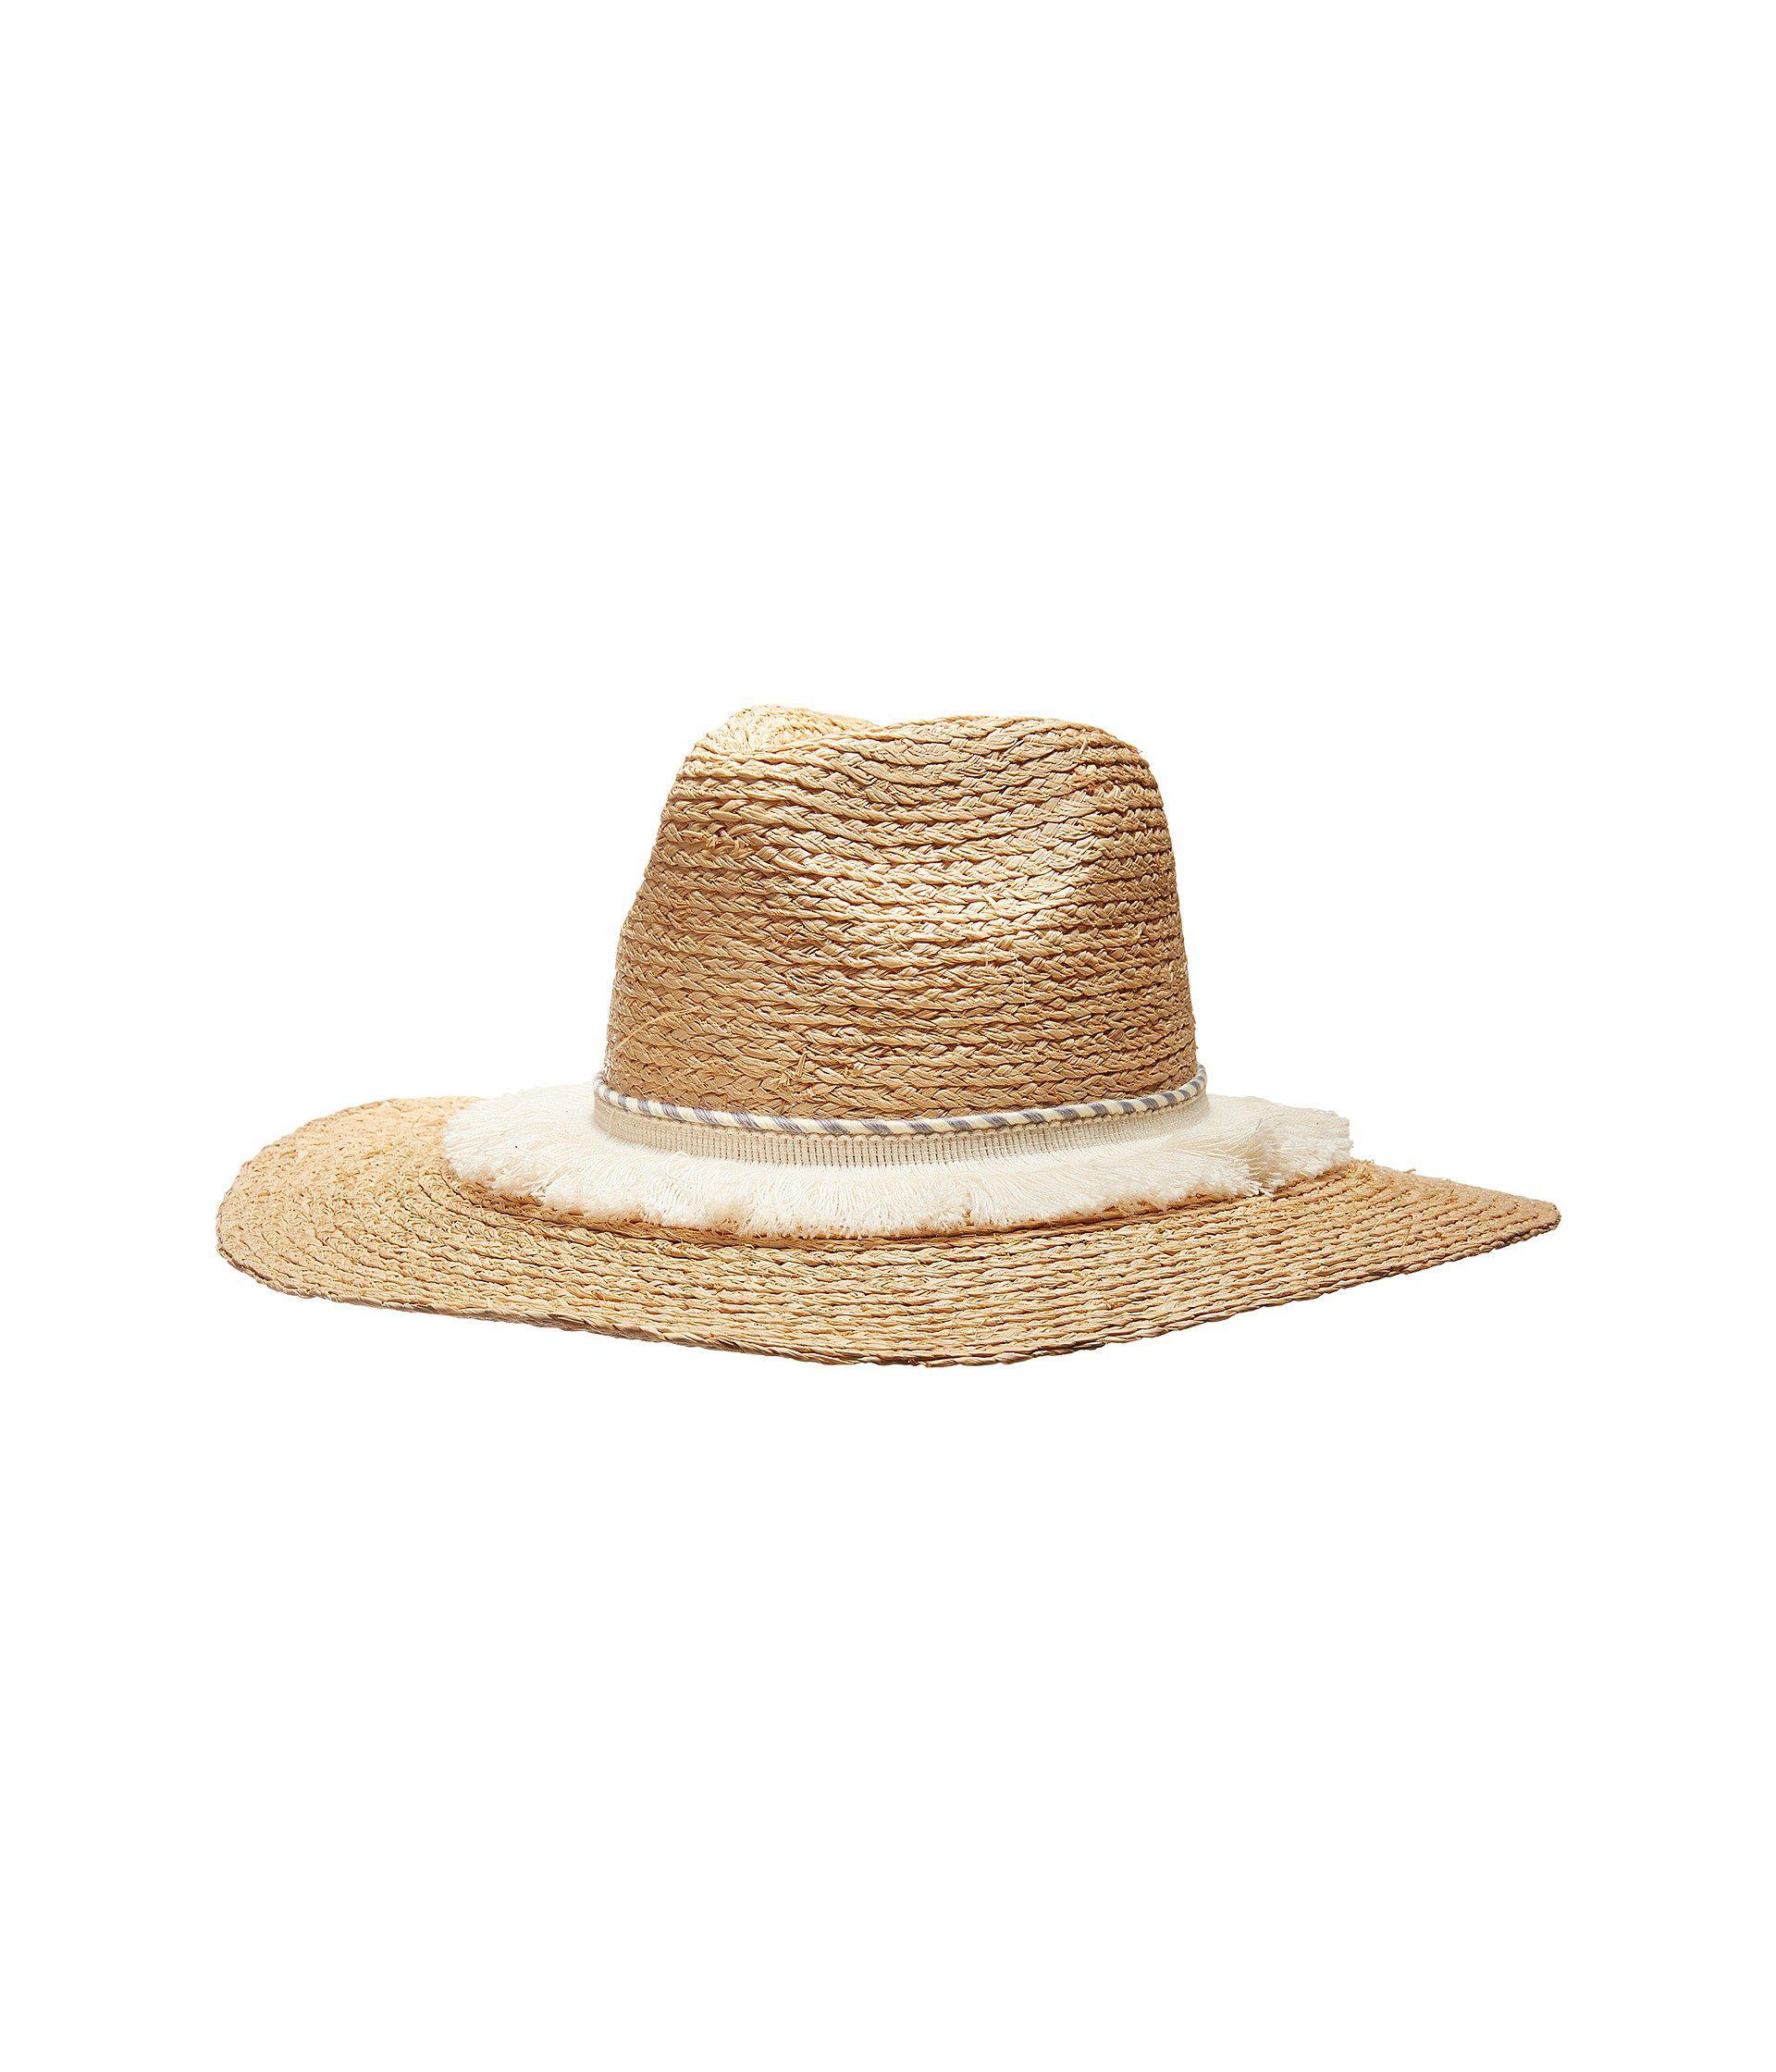 Pom Pompeii Wide Brim Hat in Tan Michael Stars 4cQMXzA